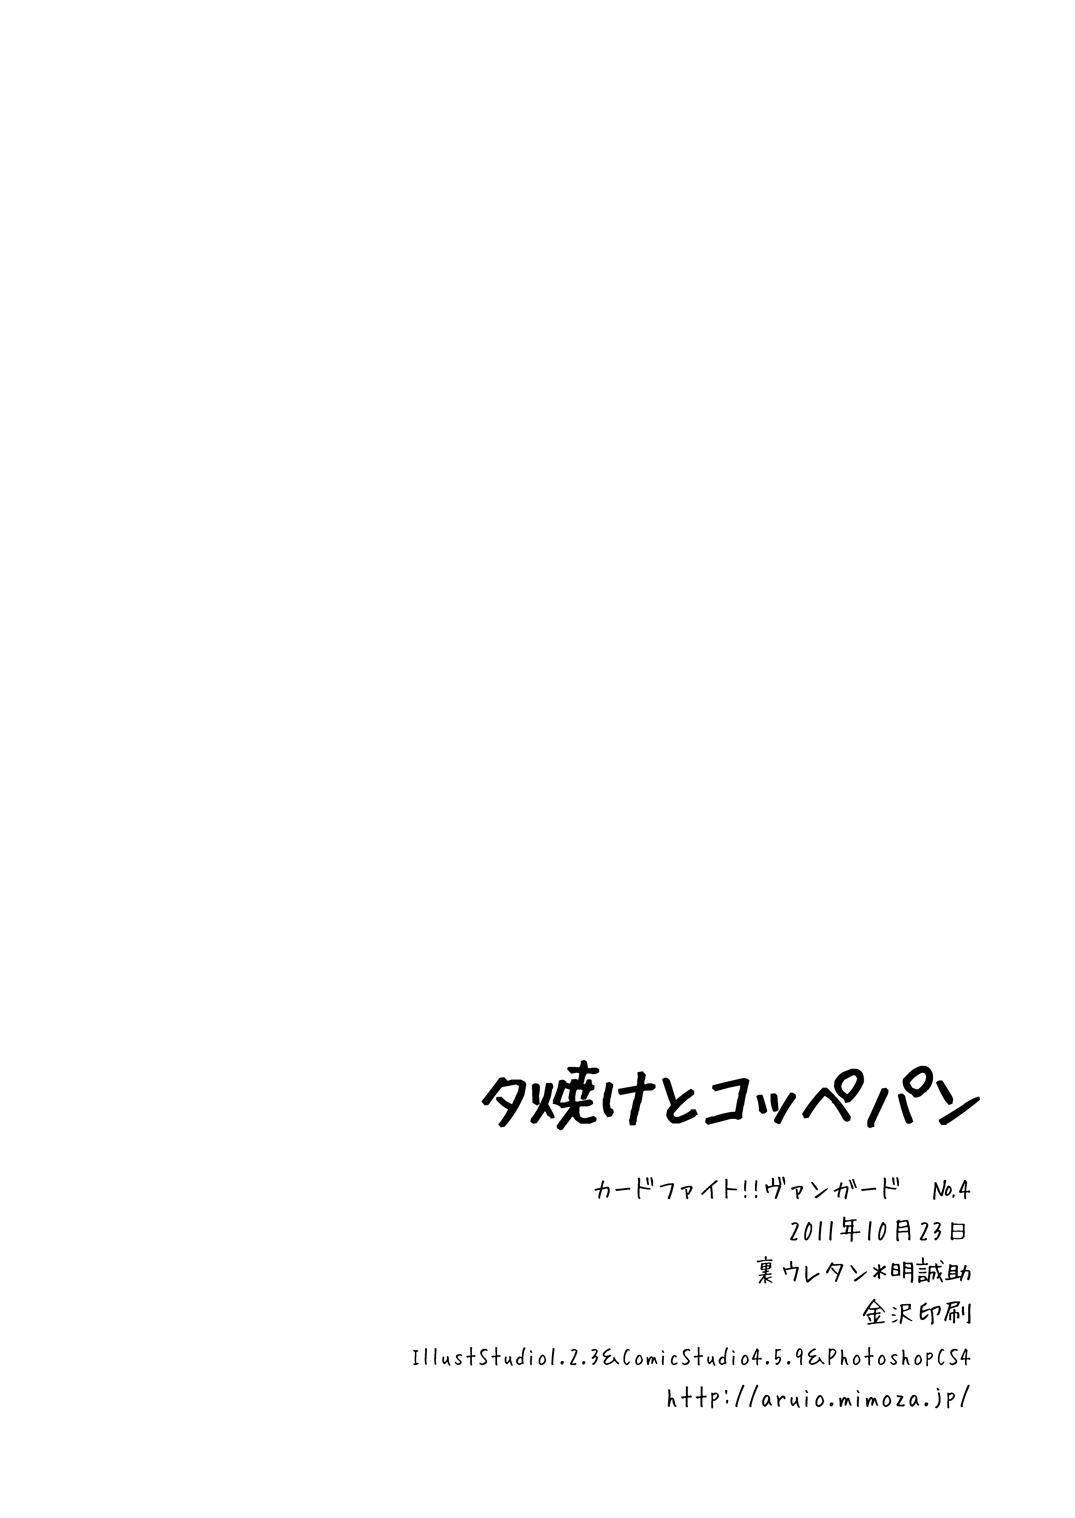 Yuuyake to Coppepan 20